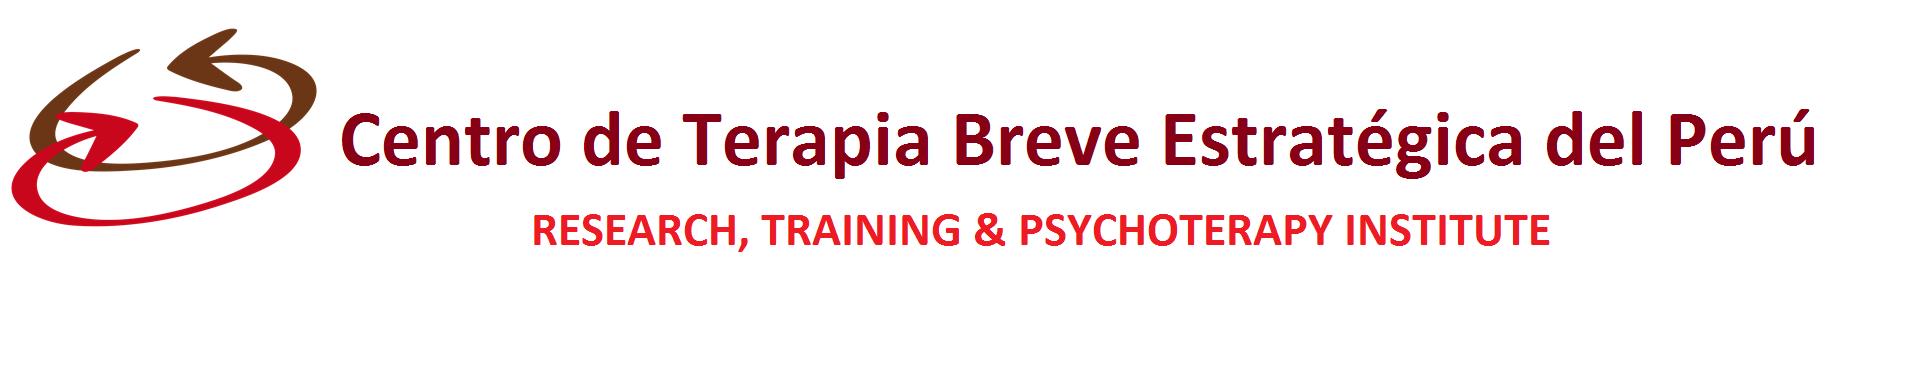 Psicoterapia Breve Estratégica: Un Nuevo Paradigma En La Psicoterapia Moderna